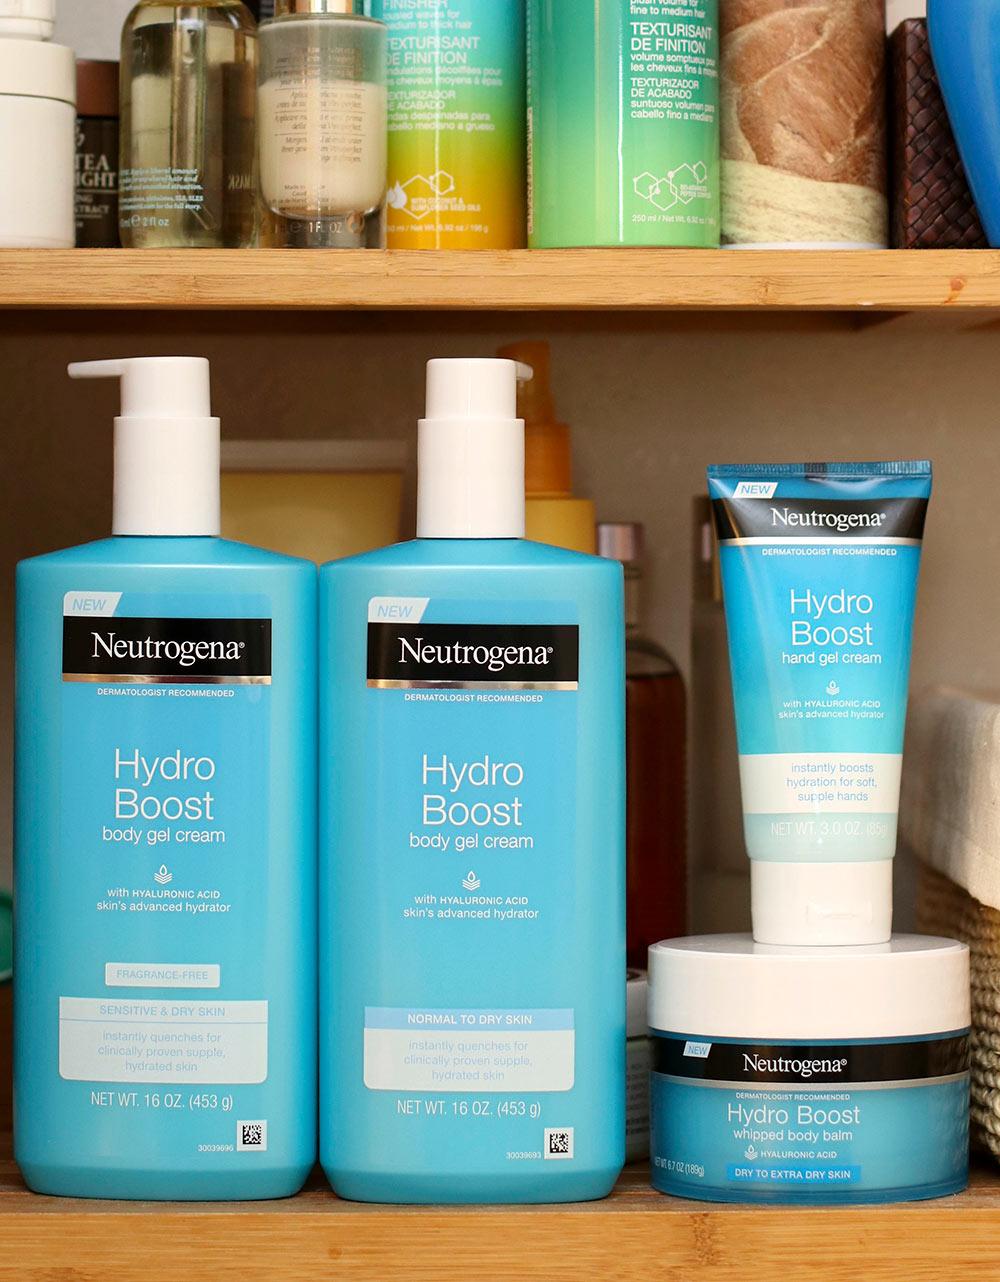 neutrogena hydroboost gel cream - [The Shower Files] Gel Cream Dreams! The New Neutrogena Hydro Boost Body Gel Cream, Body Balm and Hand Gel